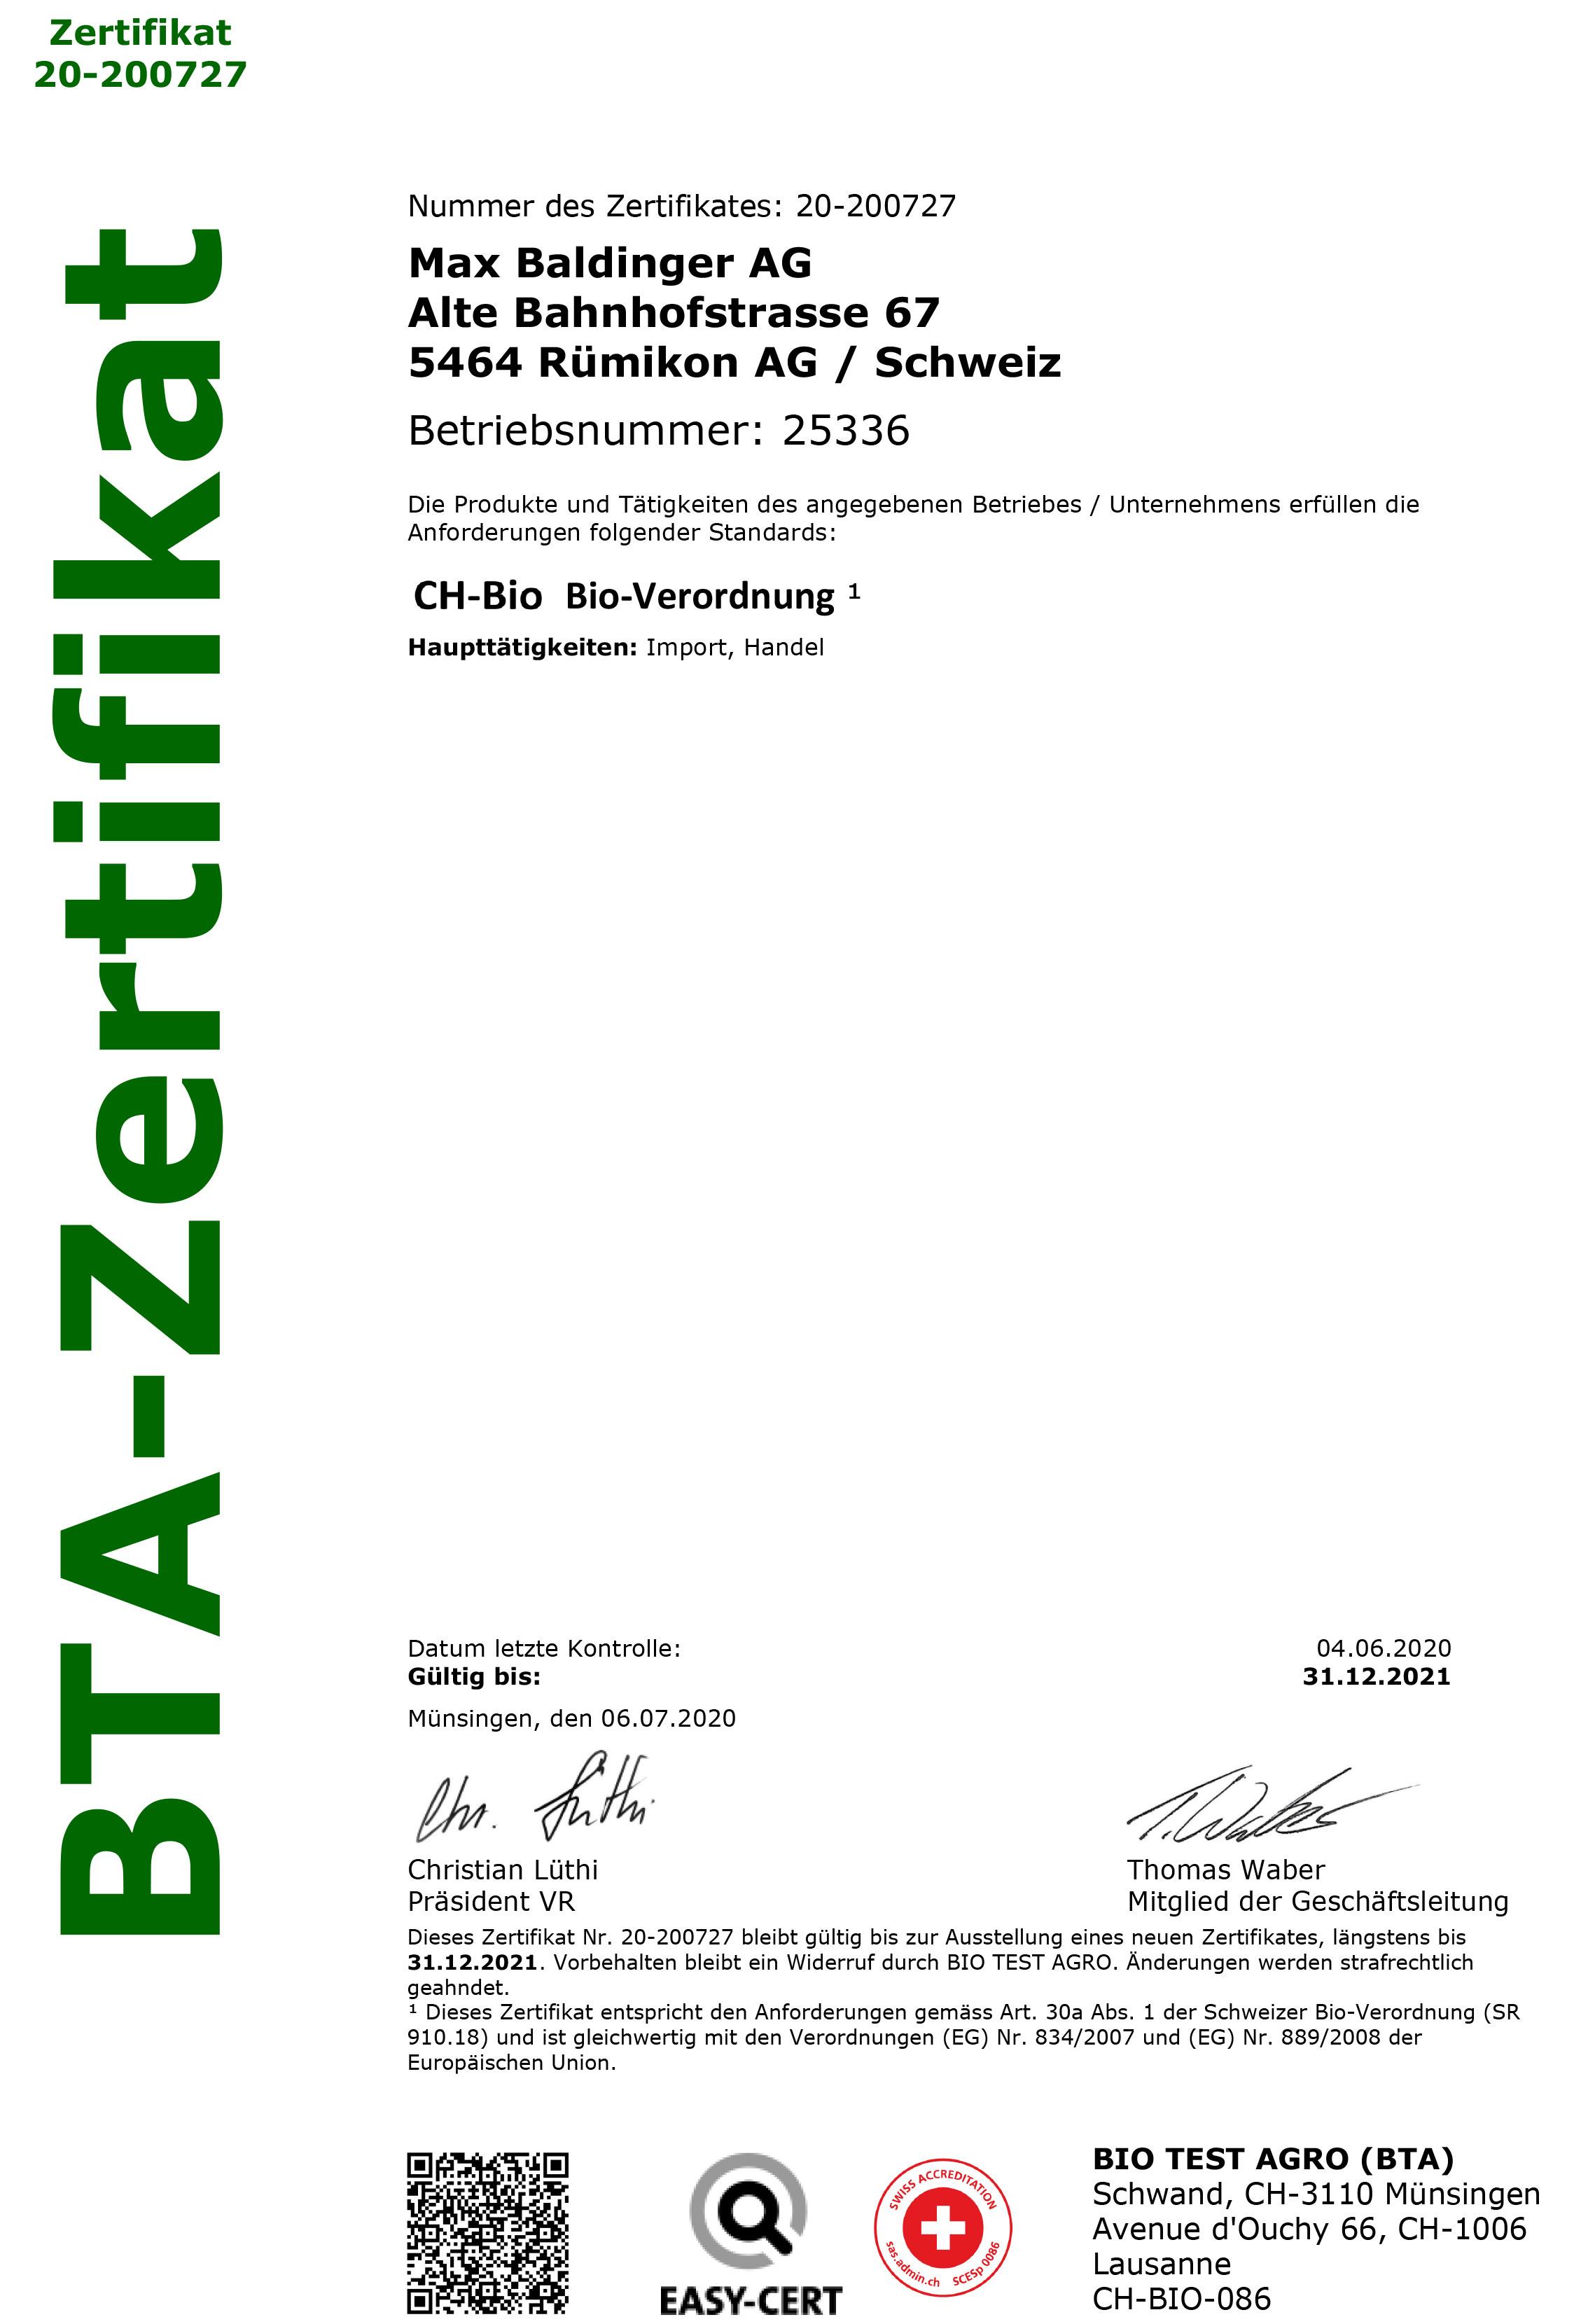 CH-BIO Zertifikat Max Baldinger AG